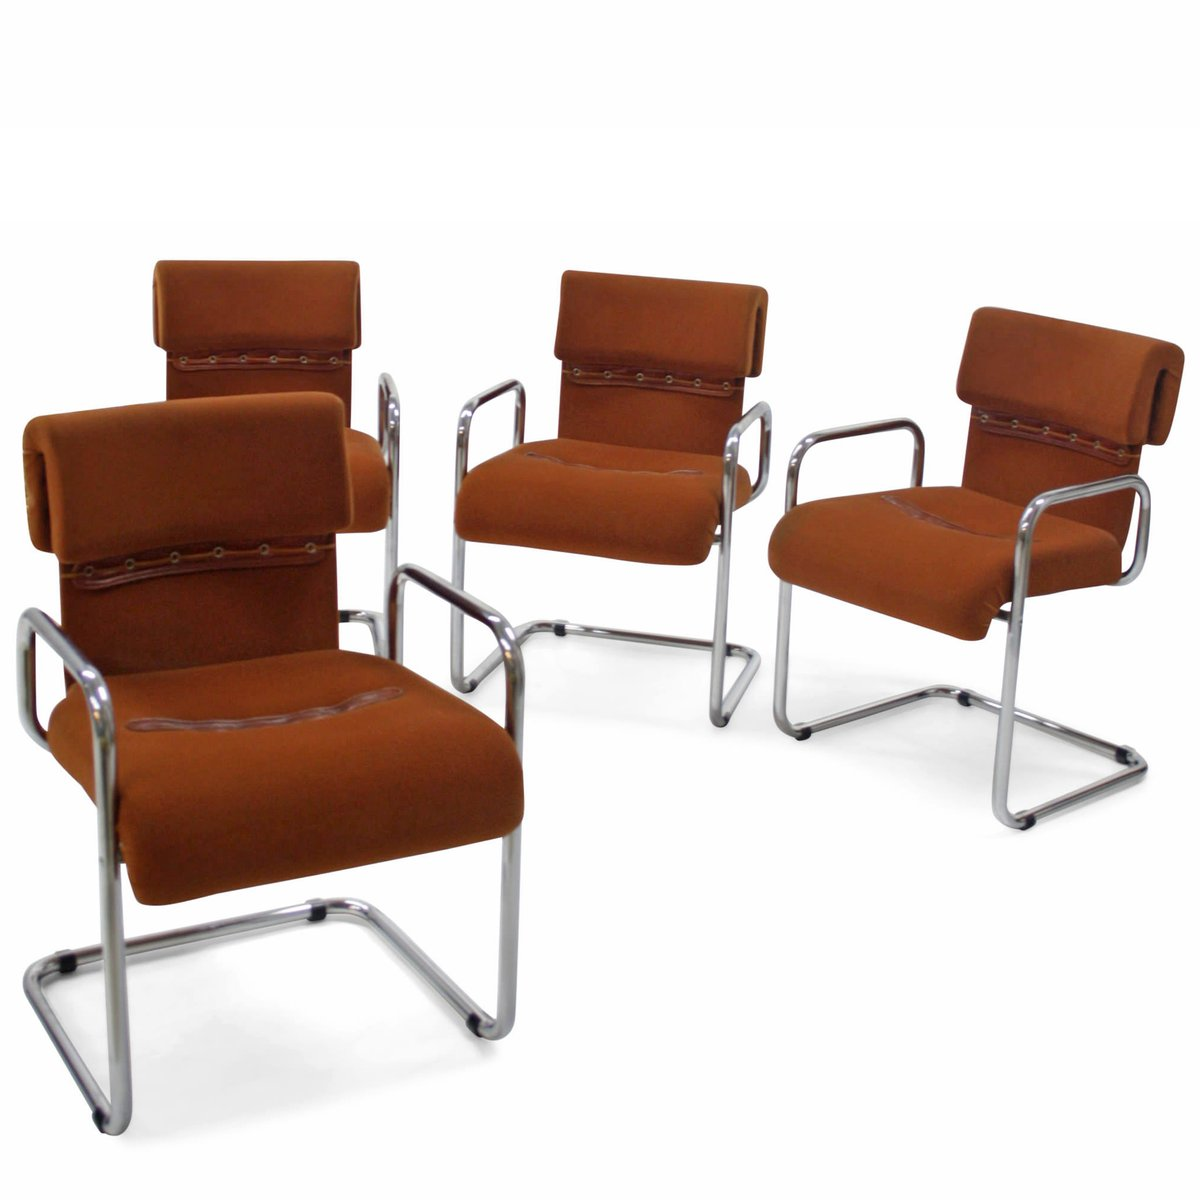 stahl textil st hle von guido faleschini f r mariani 1970er 4er set bei pamono kaufen. Black Bedroom Furniture Sets. Home Design Ideas